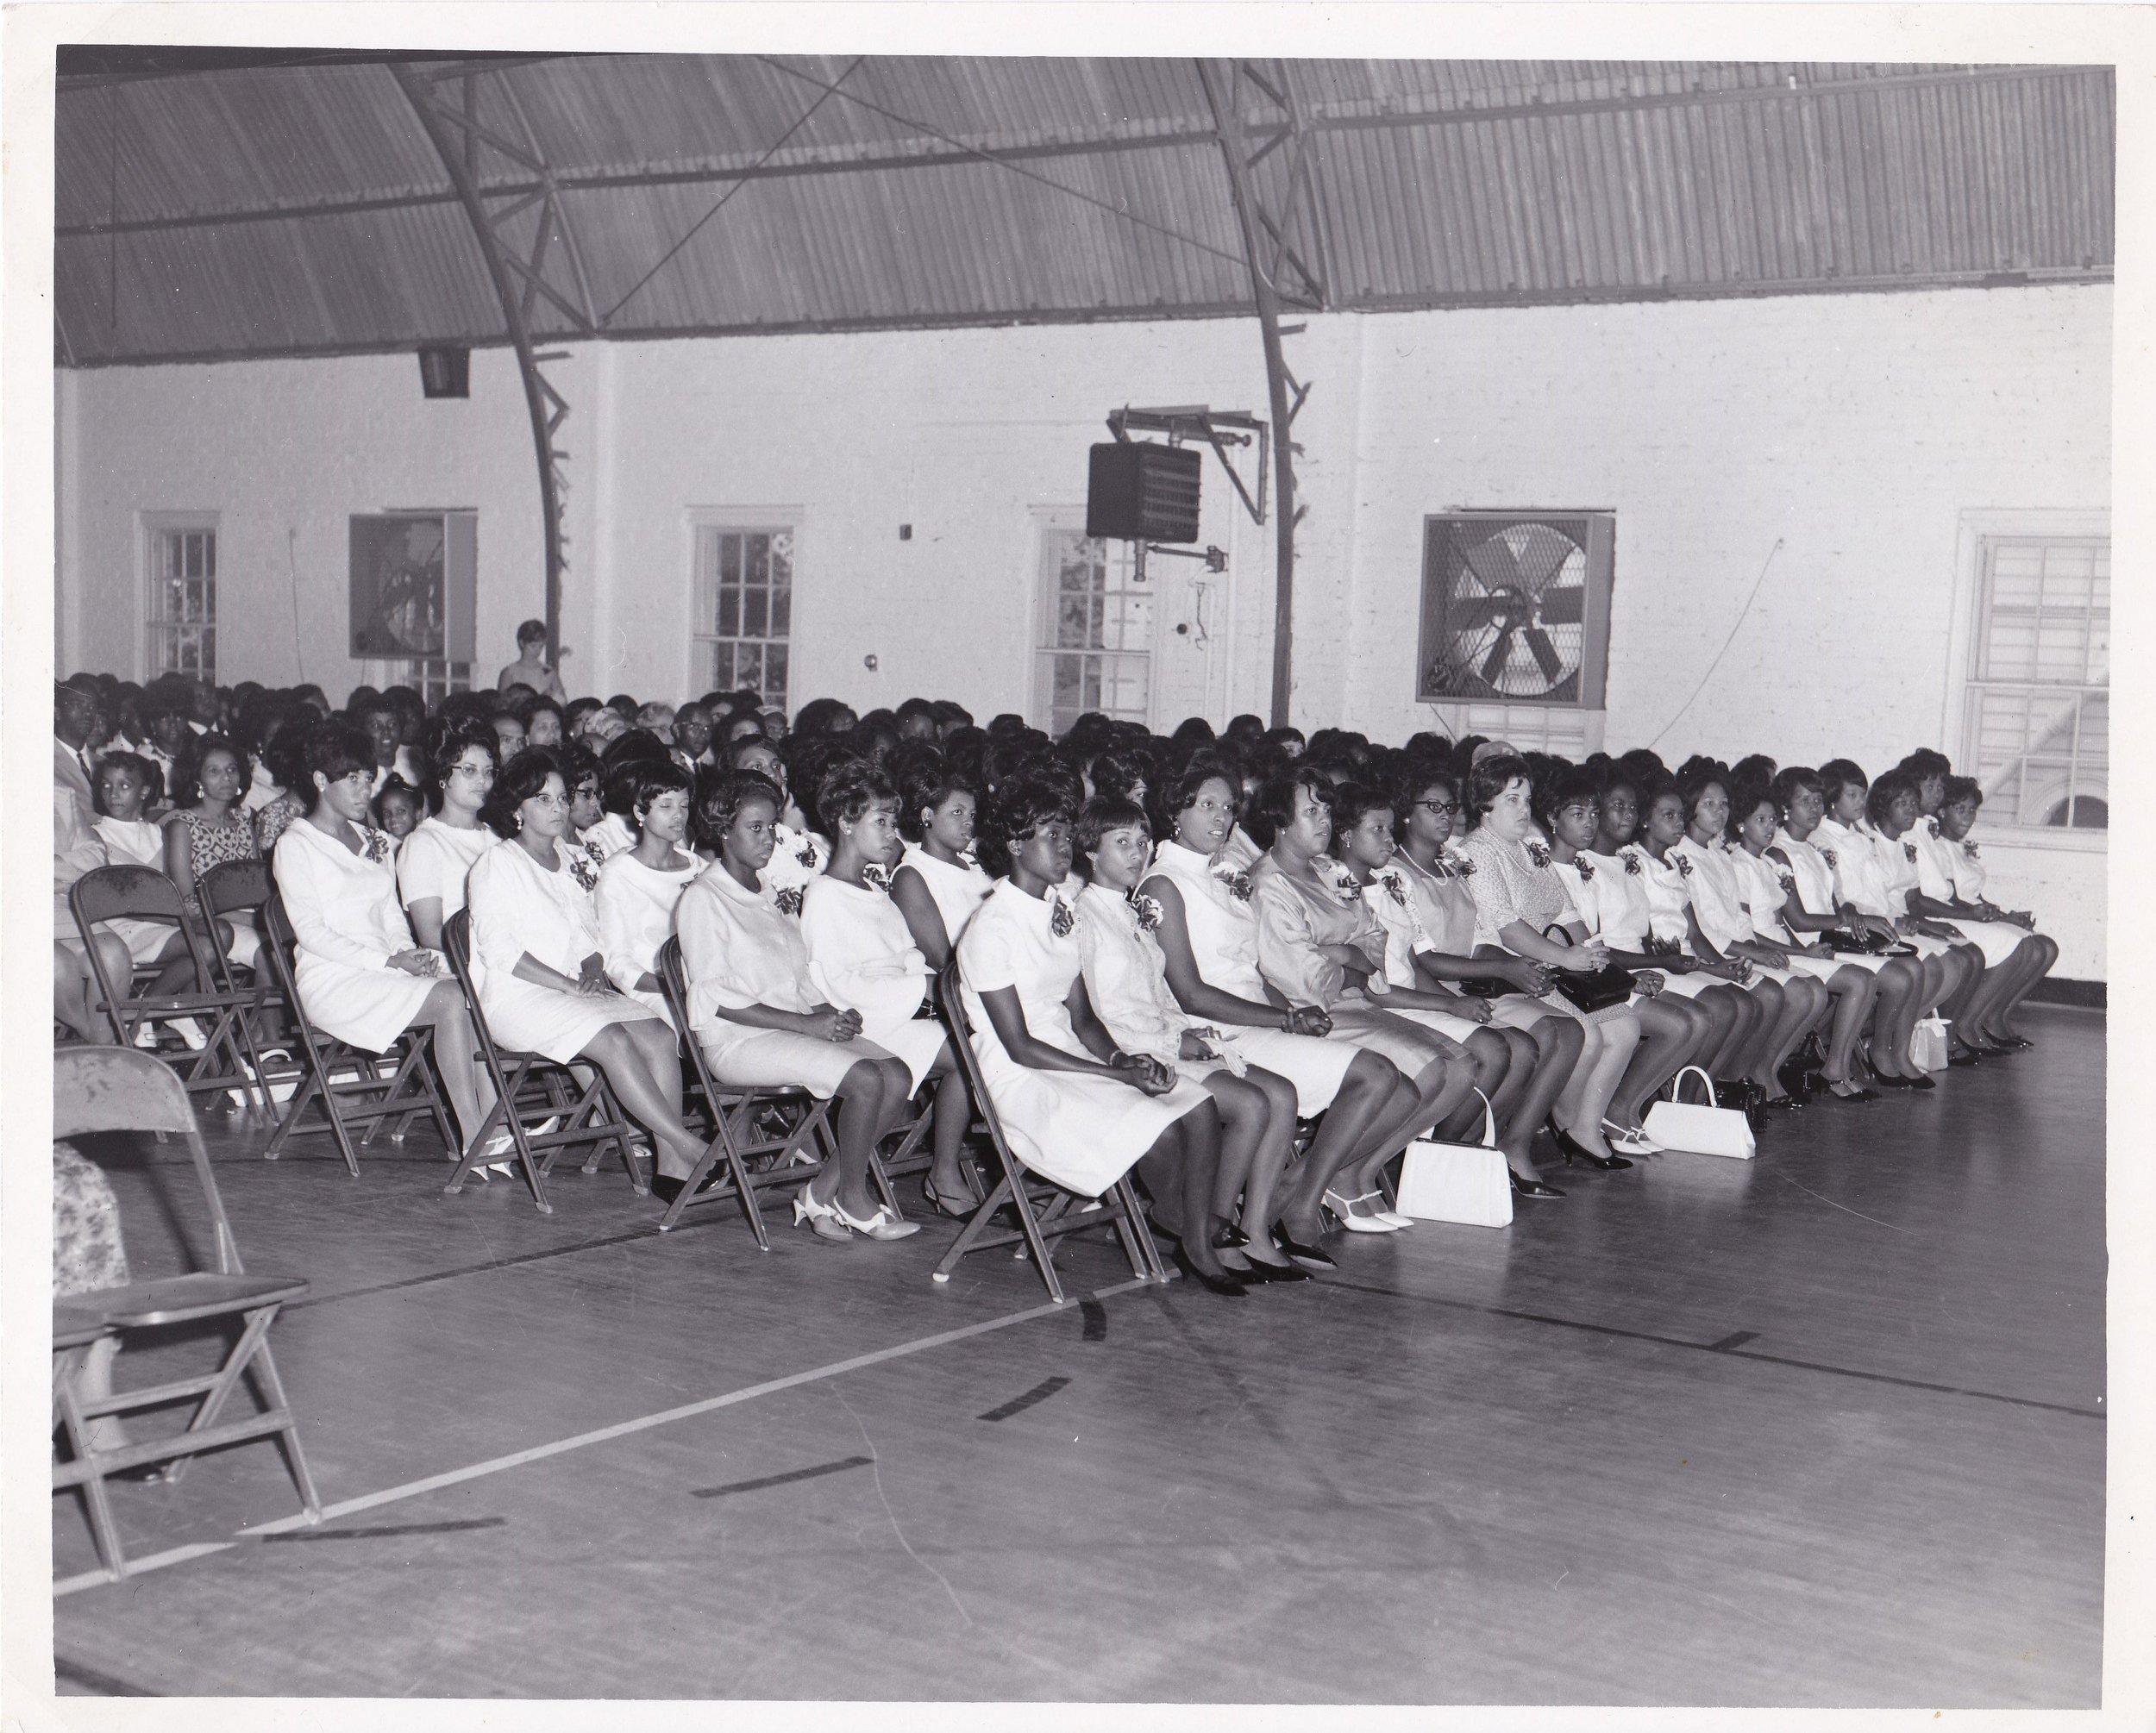 '67 Class of 1967